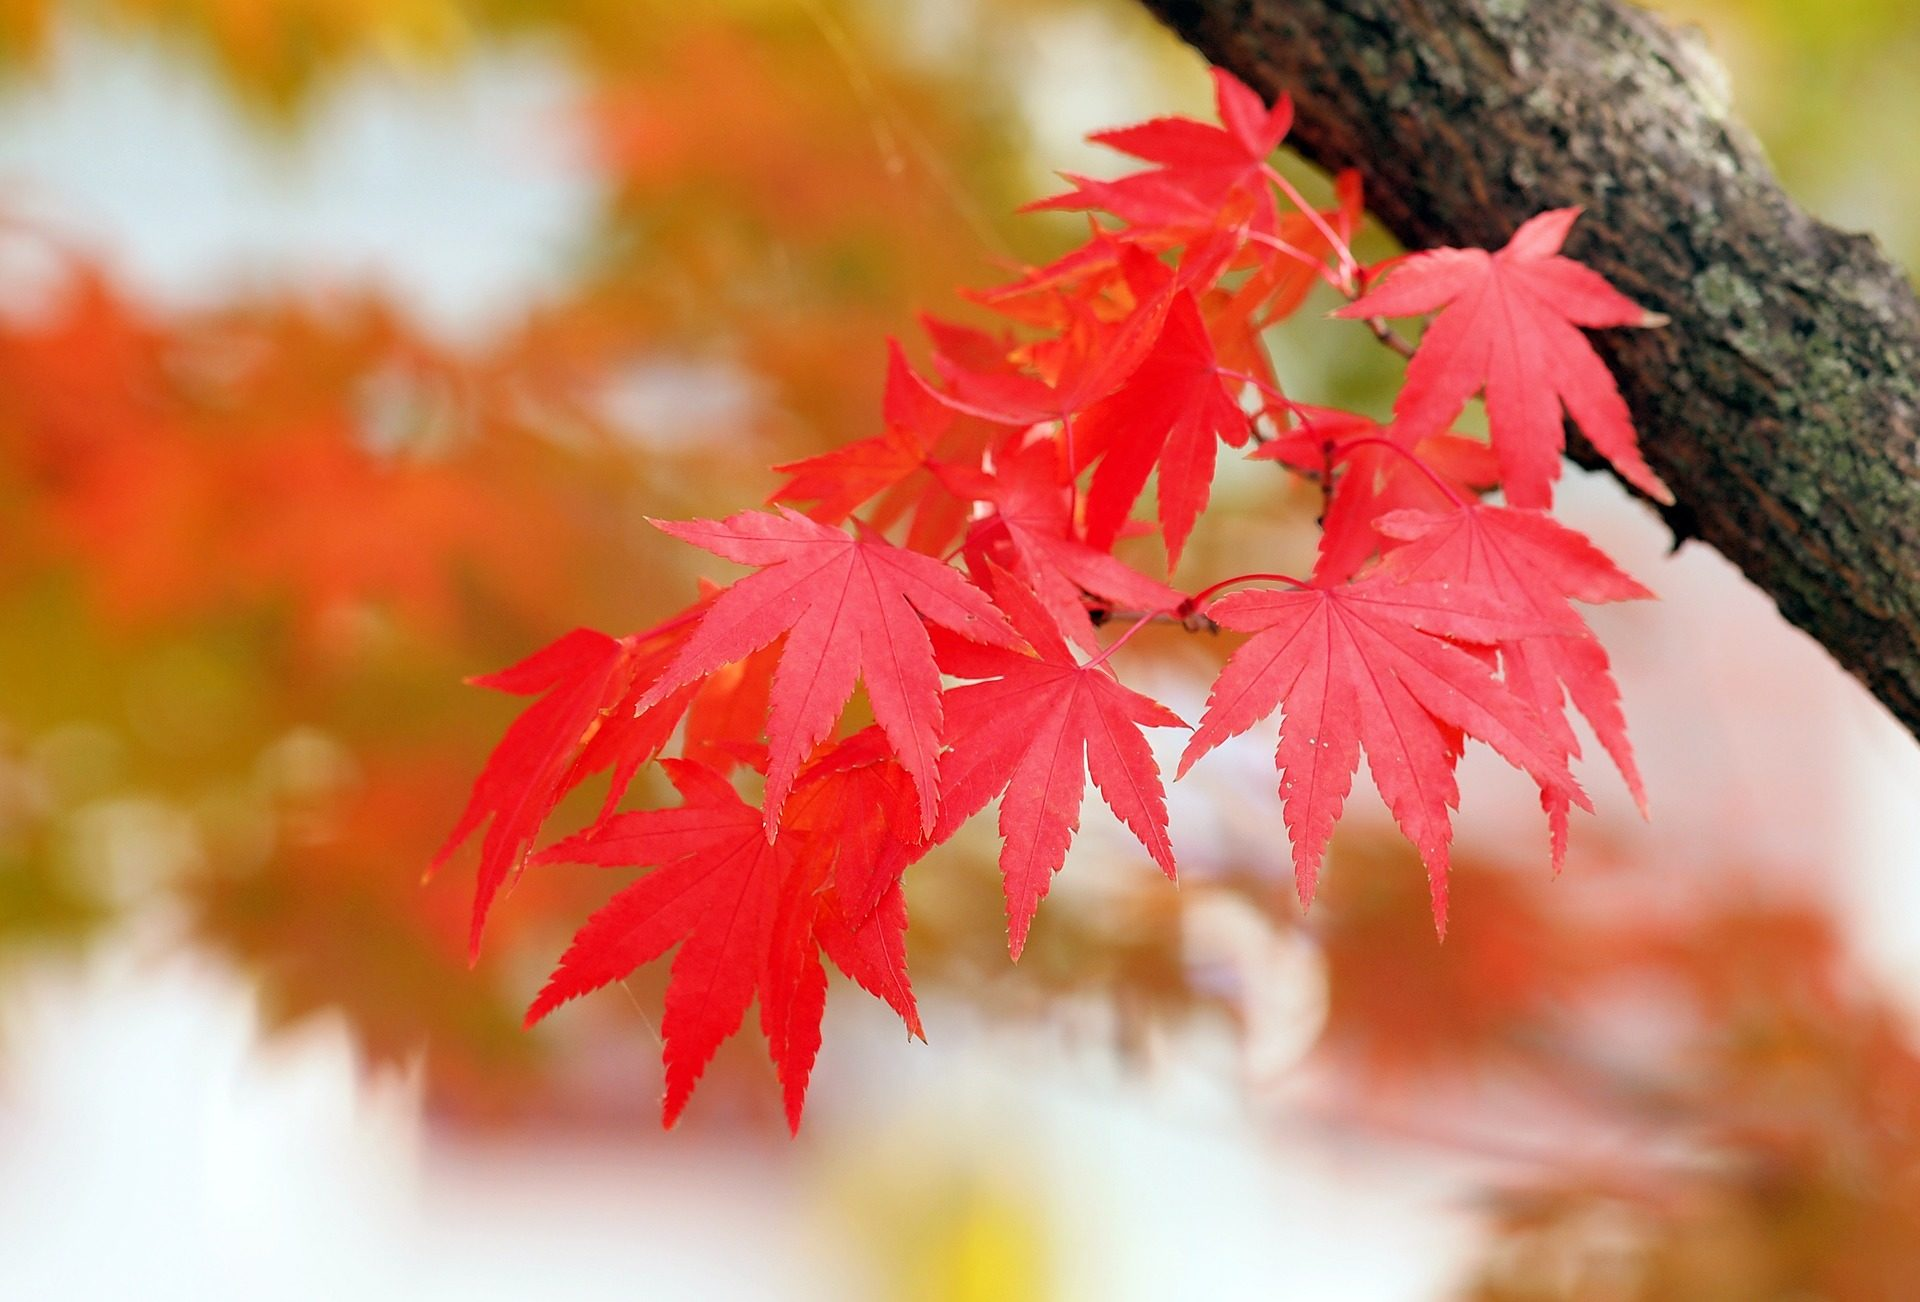 foglie, árbol, Rosso, Acero, autunno - Sfondi HD - Professor-falken.com